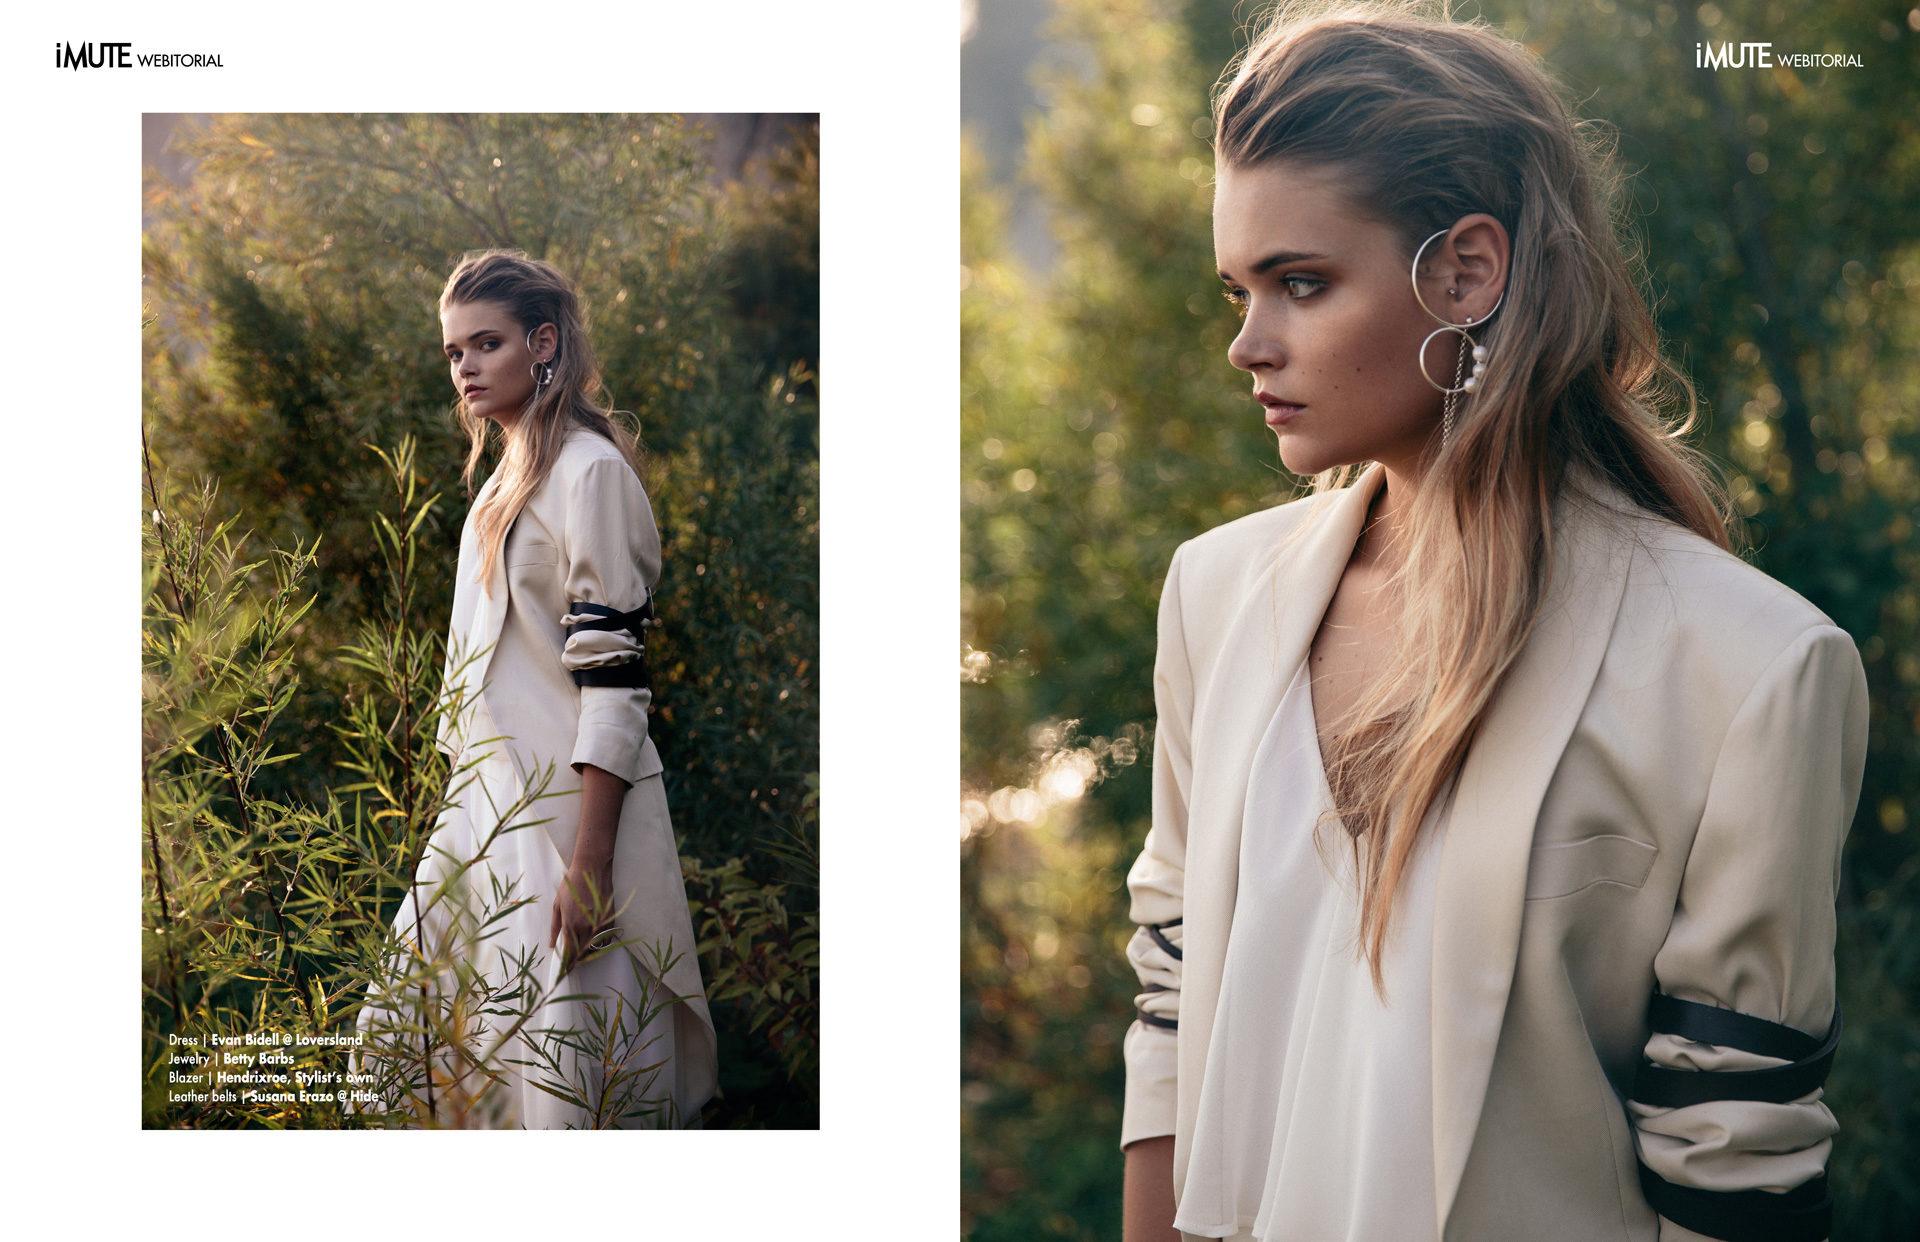 Linger webitorial for iMute Magazine Photographer|Peter Nguyen Model| Ashley Dunnington @Elite Toronto Stylist|Lea Krpan Makeup|Christina Nguyen Hair|Erika Fung